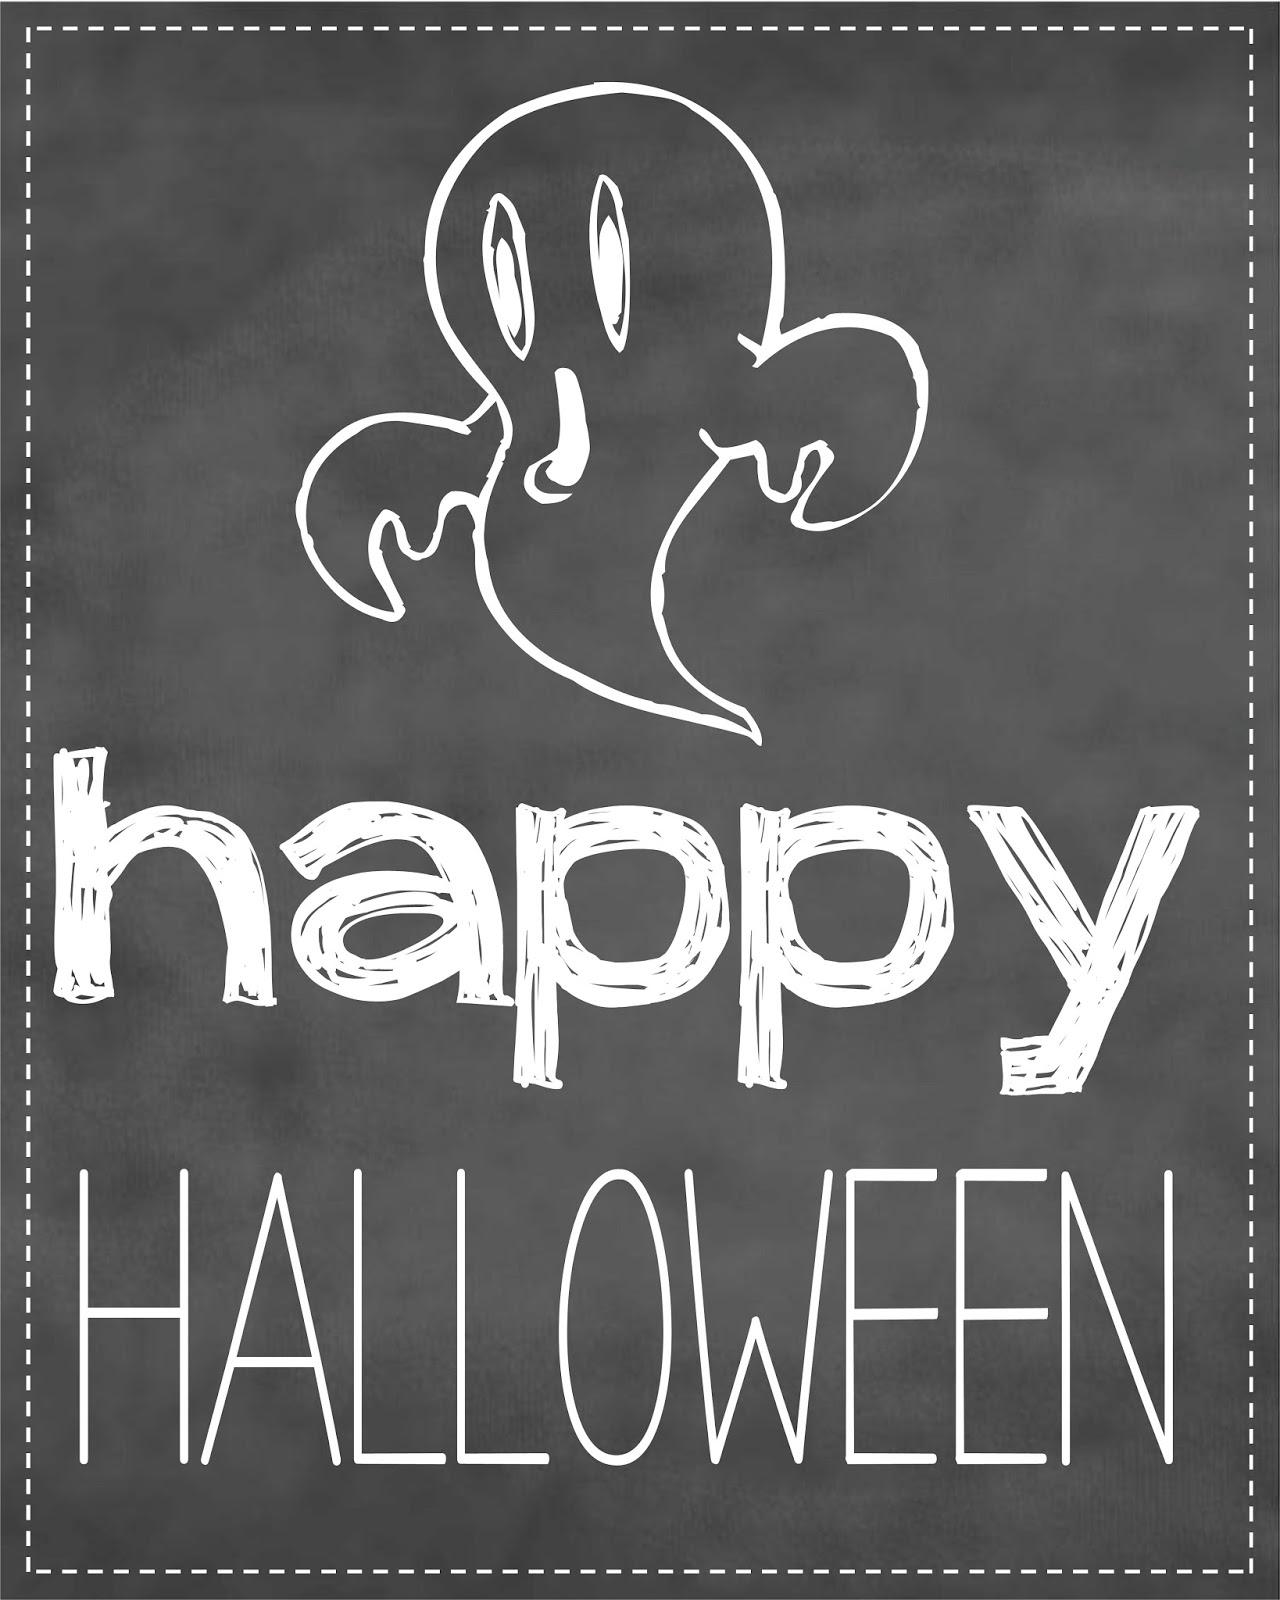 Slobbery image for halloween signs printable